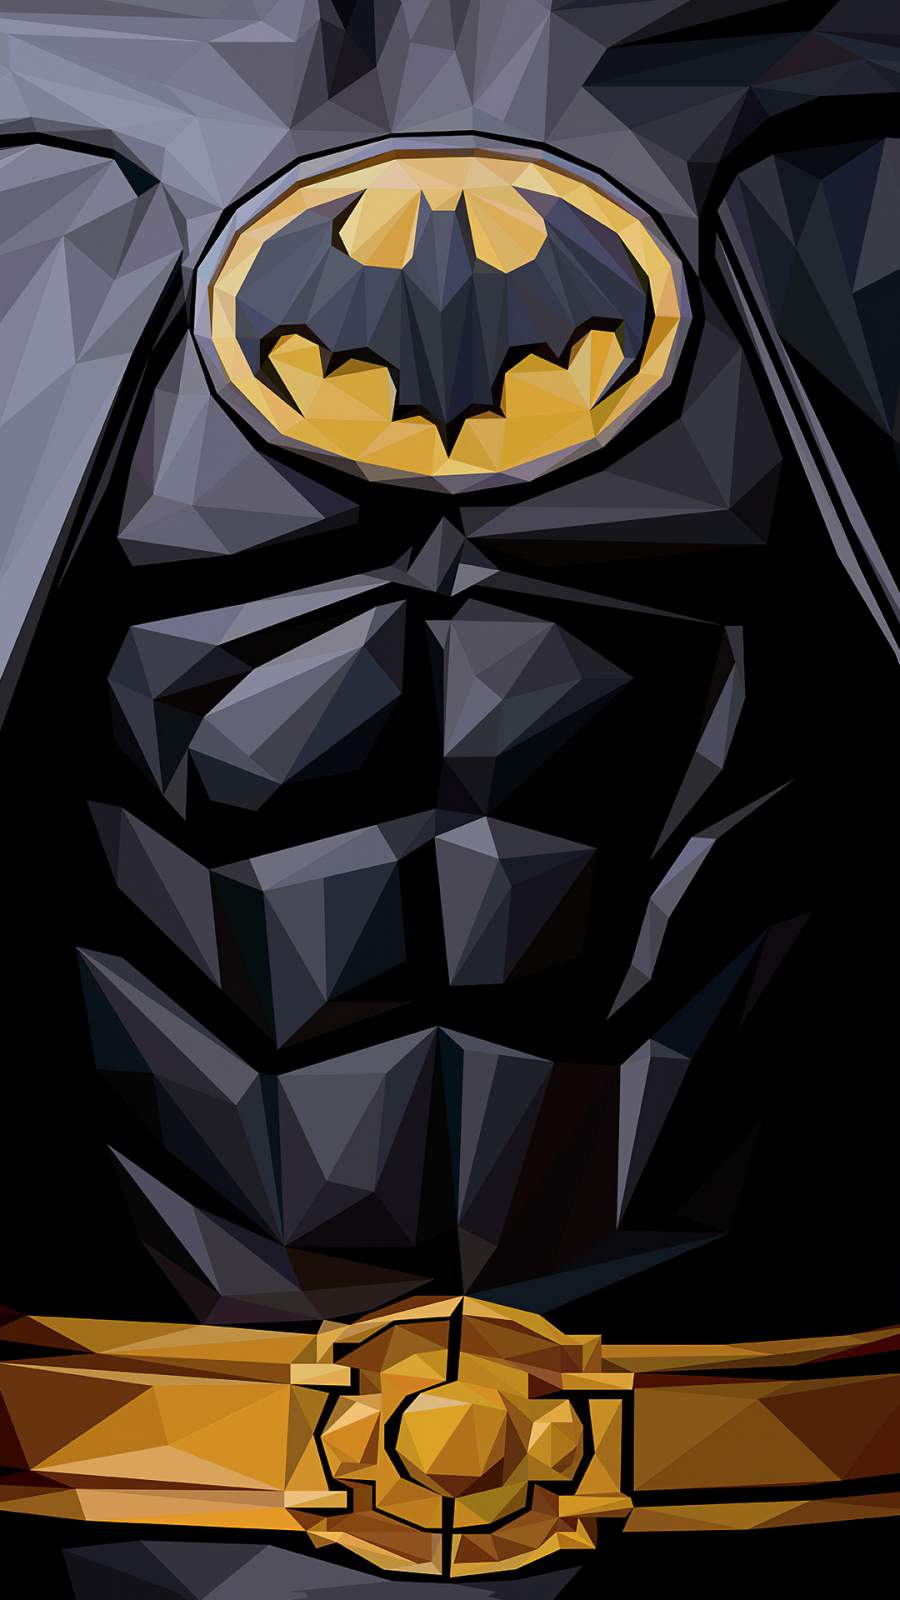 Batman Polygon 4K iPhone Wallpaper